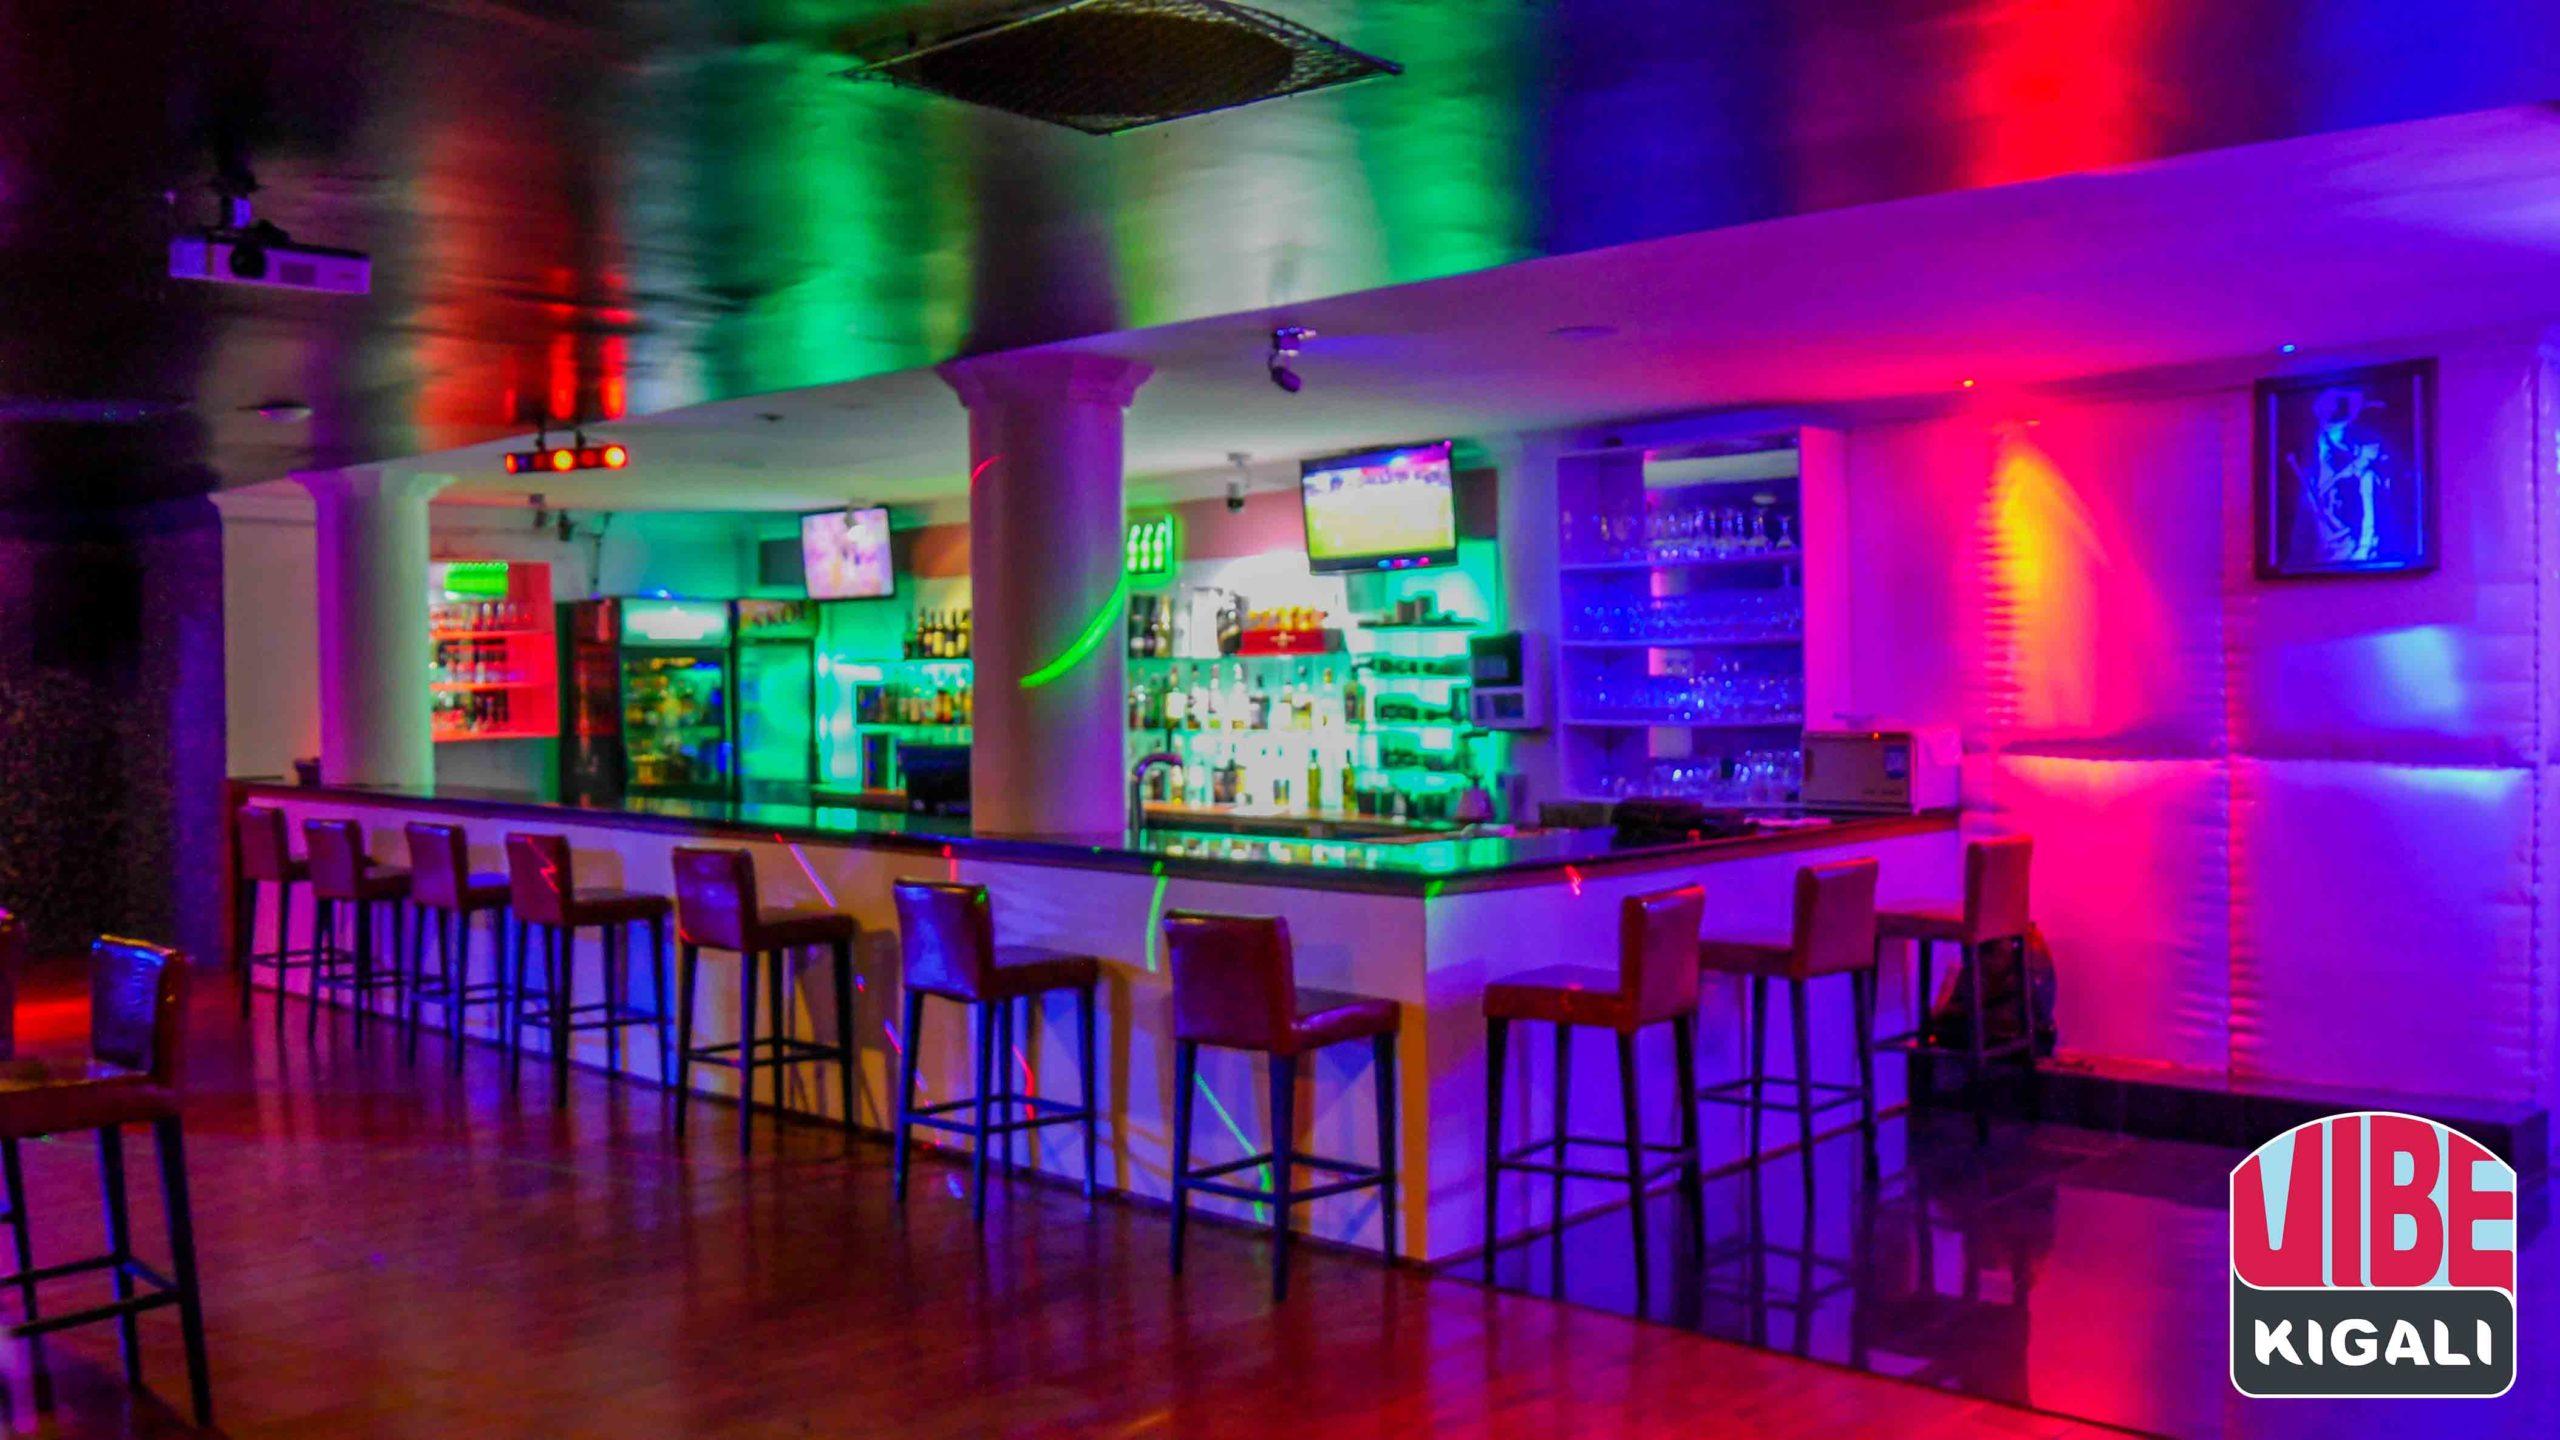 billionaires-bar-restaurant-kigali-7-7